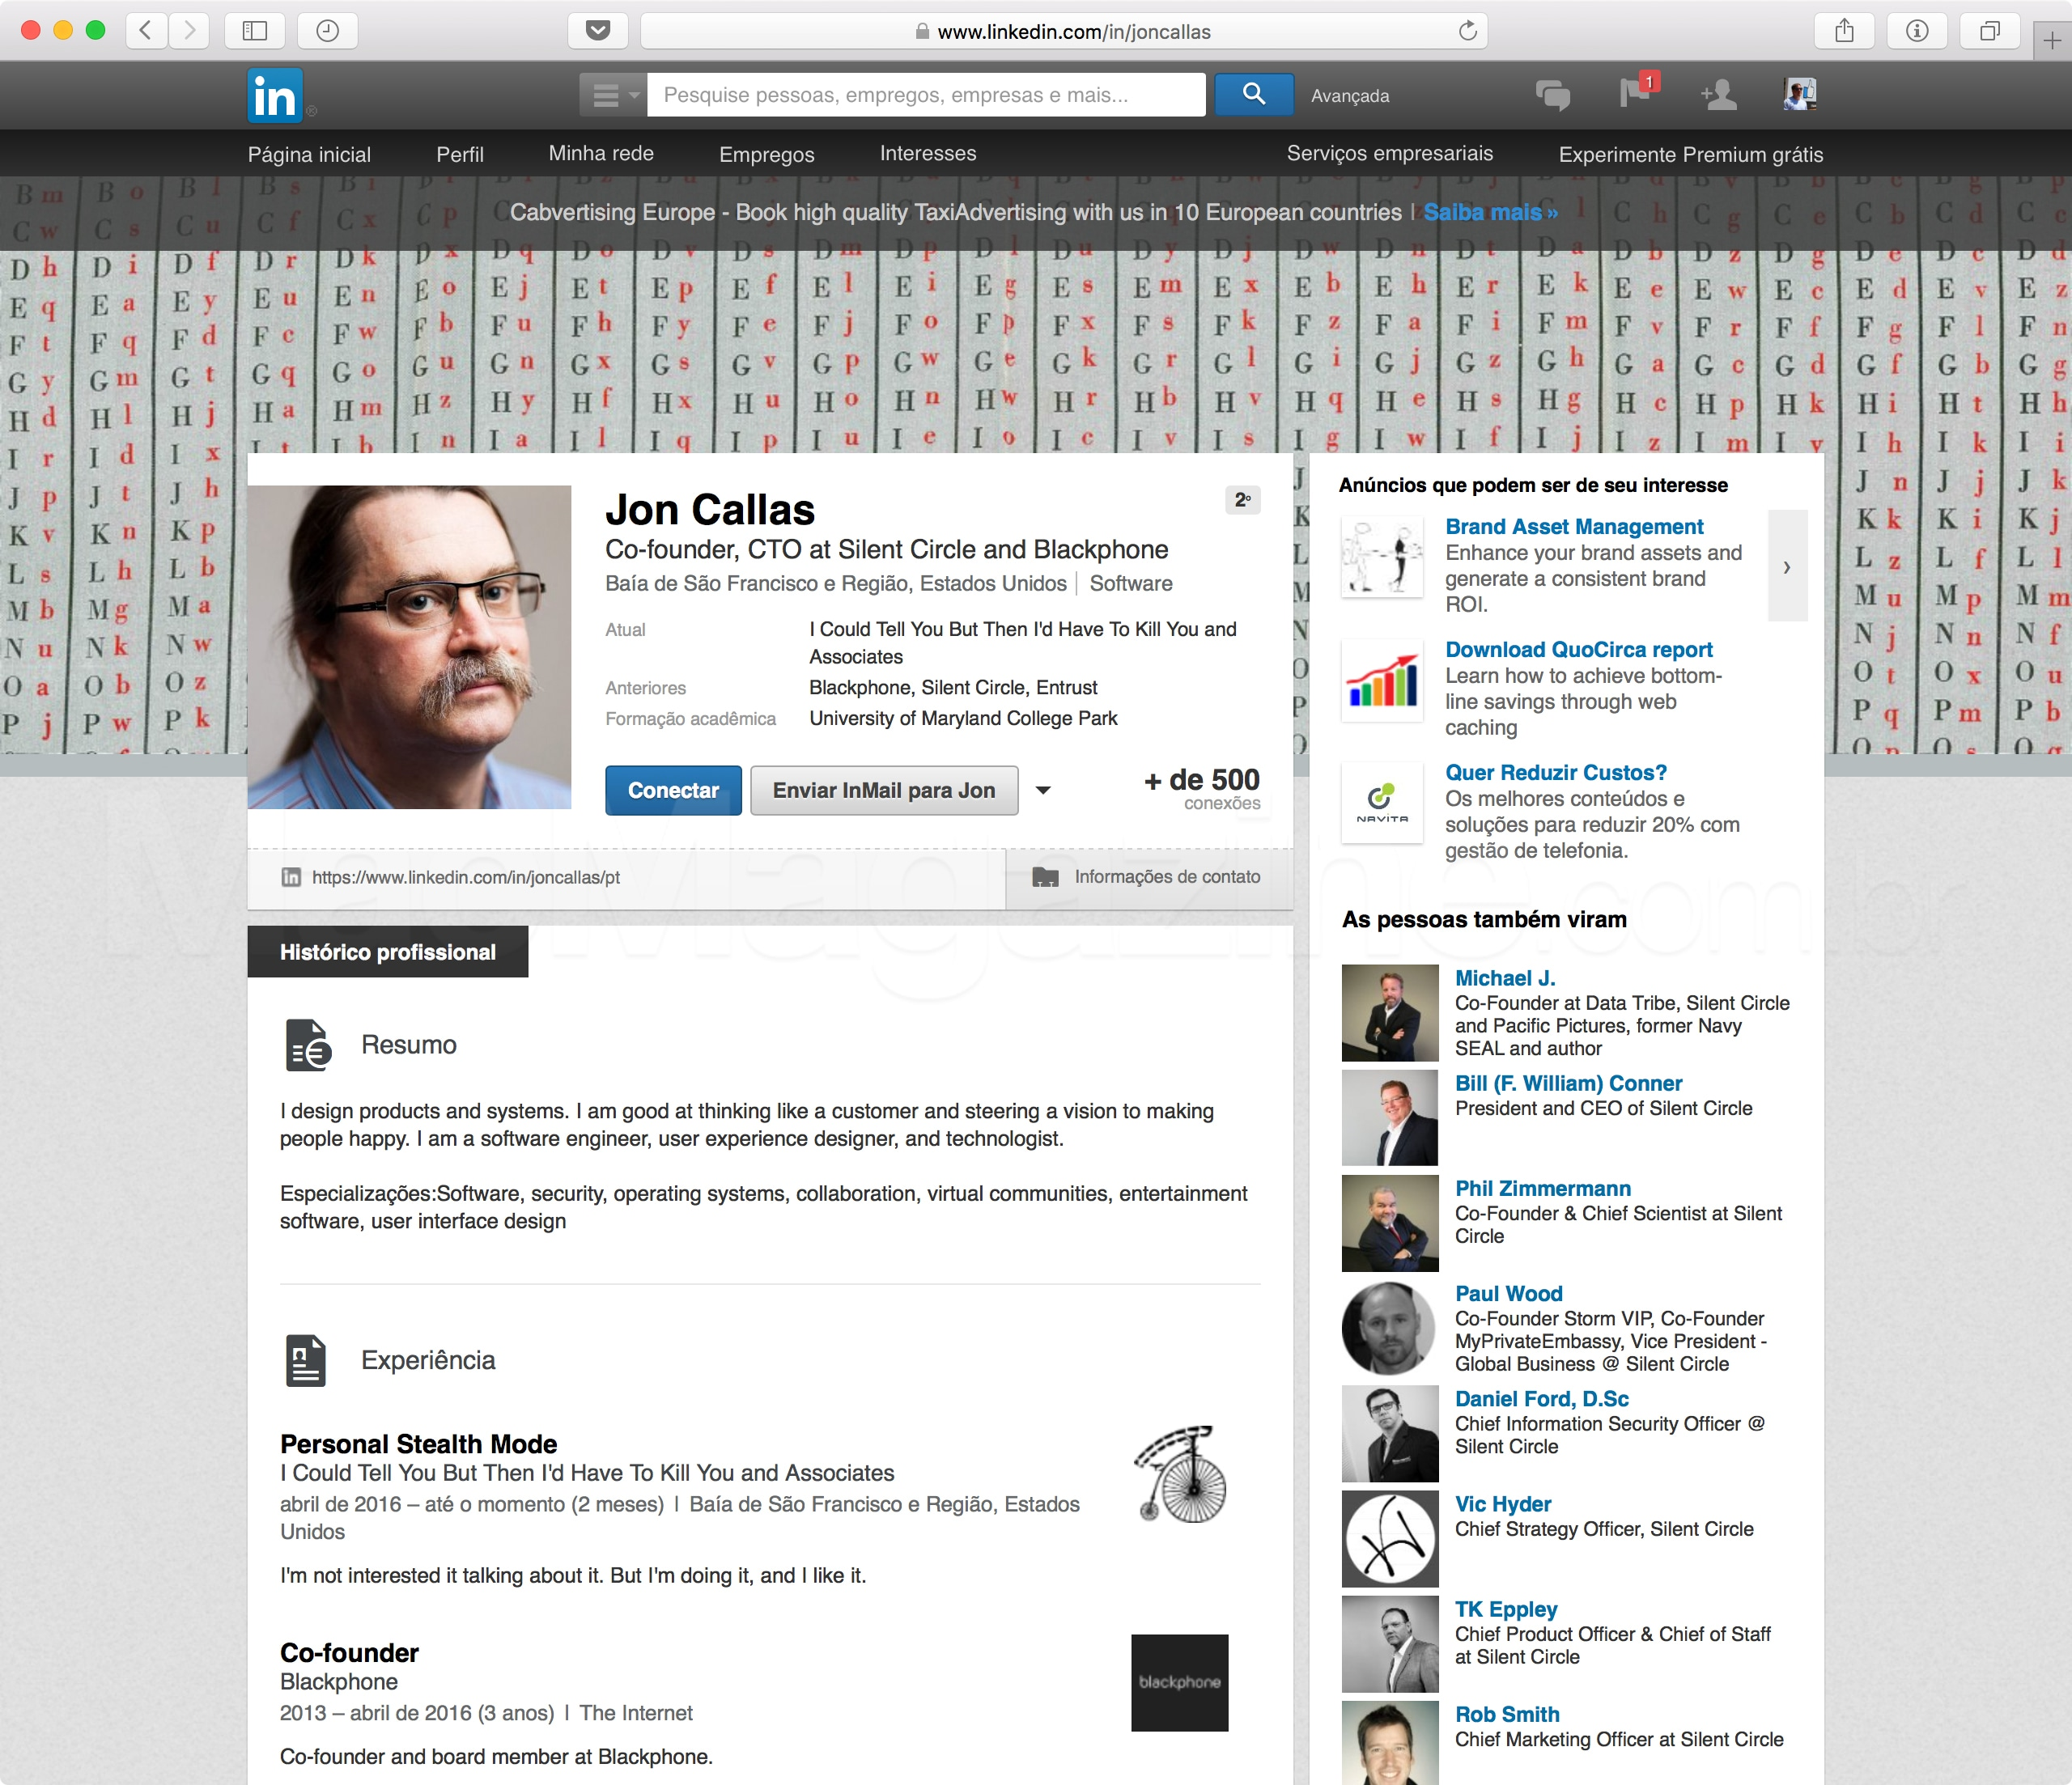 Perfil de Jon Callas no LinkedIn